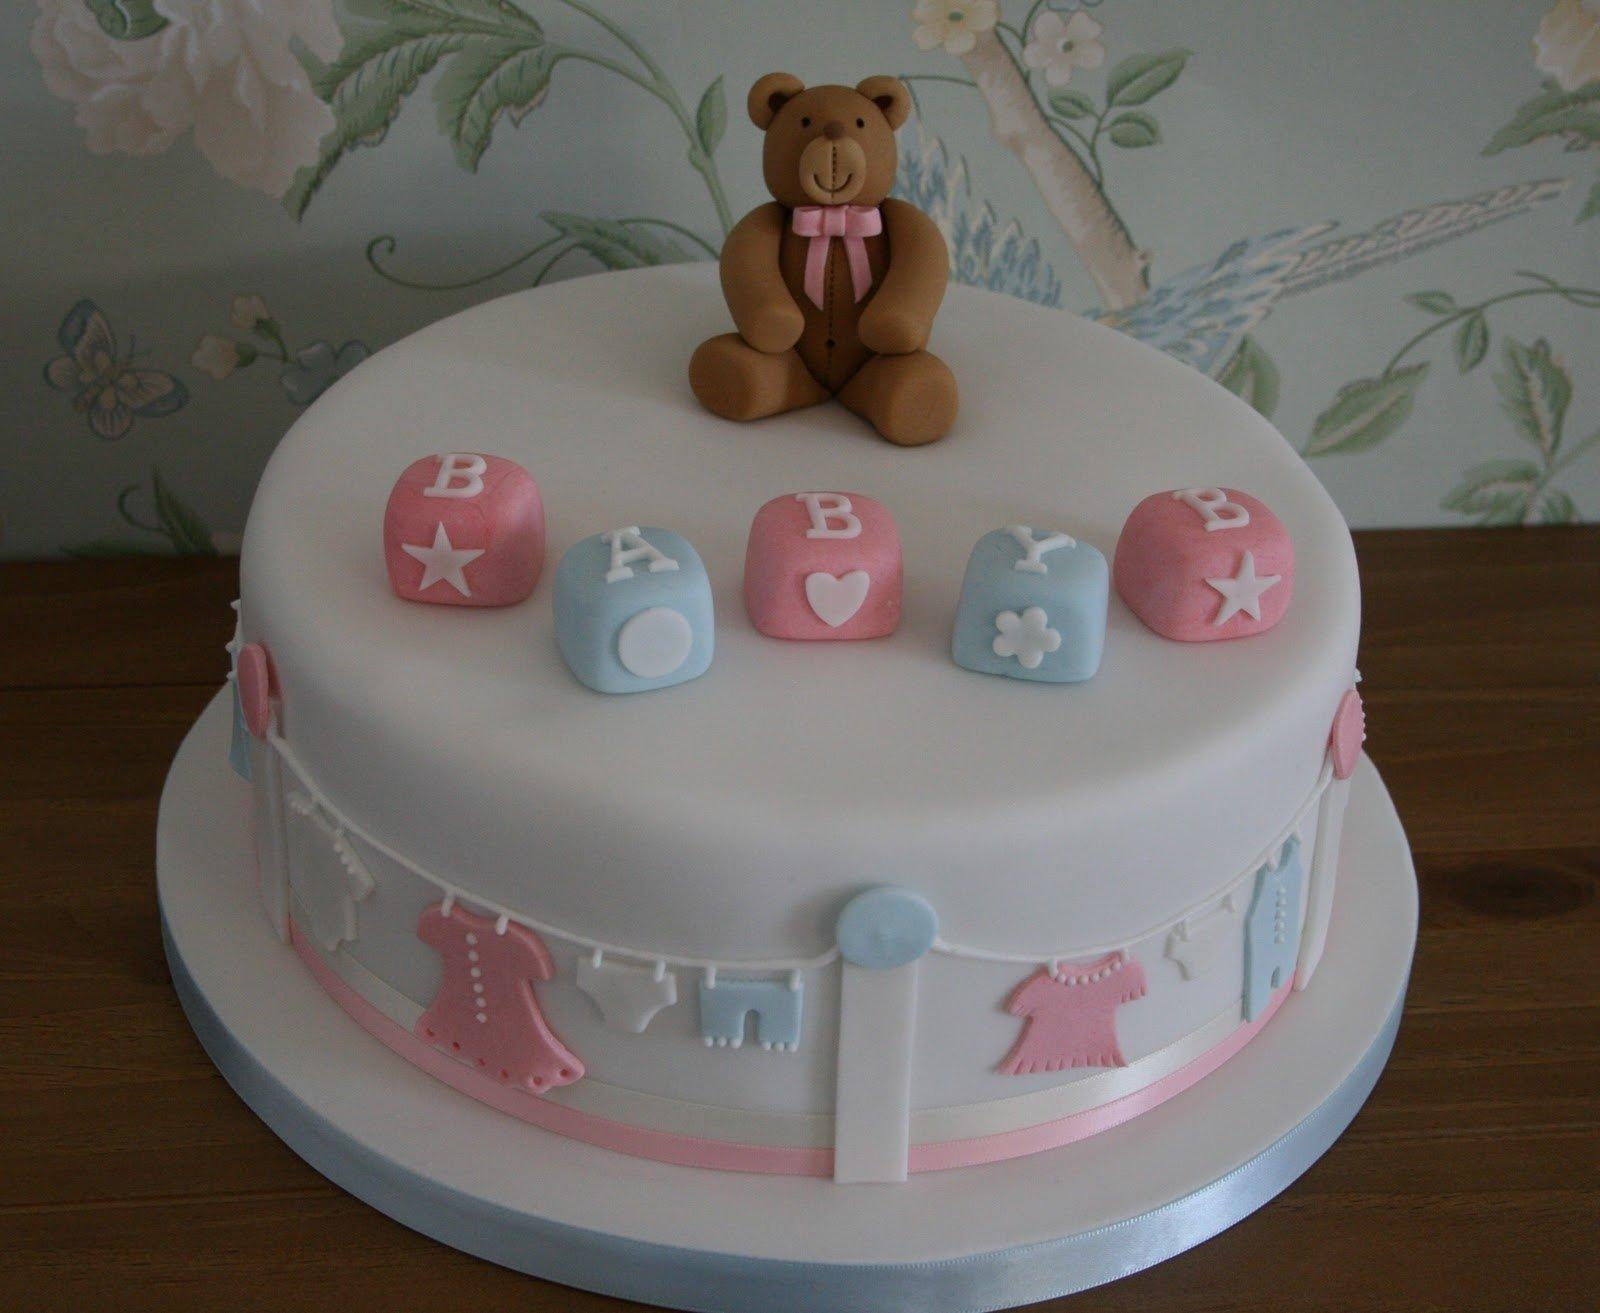 10 Elegant Cake Ideas For Baby Shower cute baby shower cake ideas omega center ideas for baby 2 2020